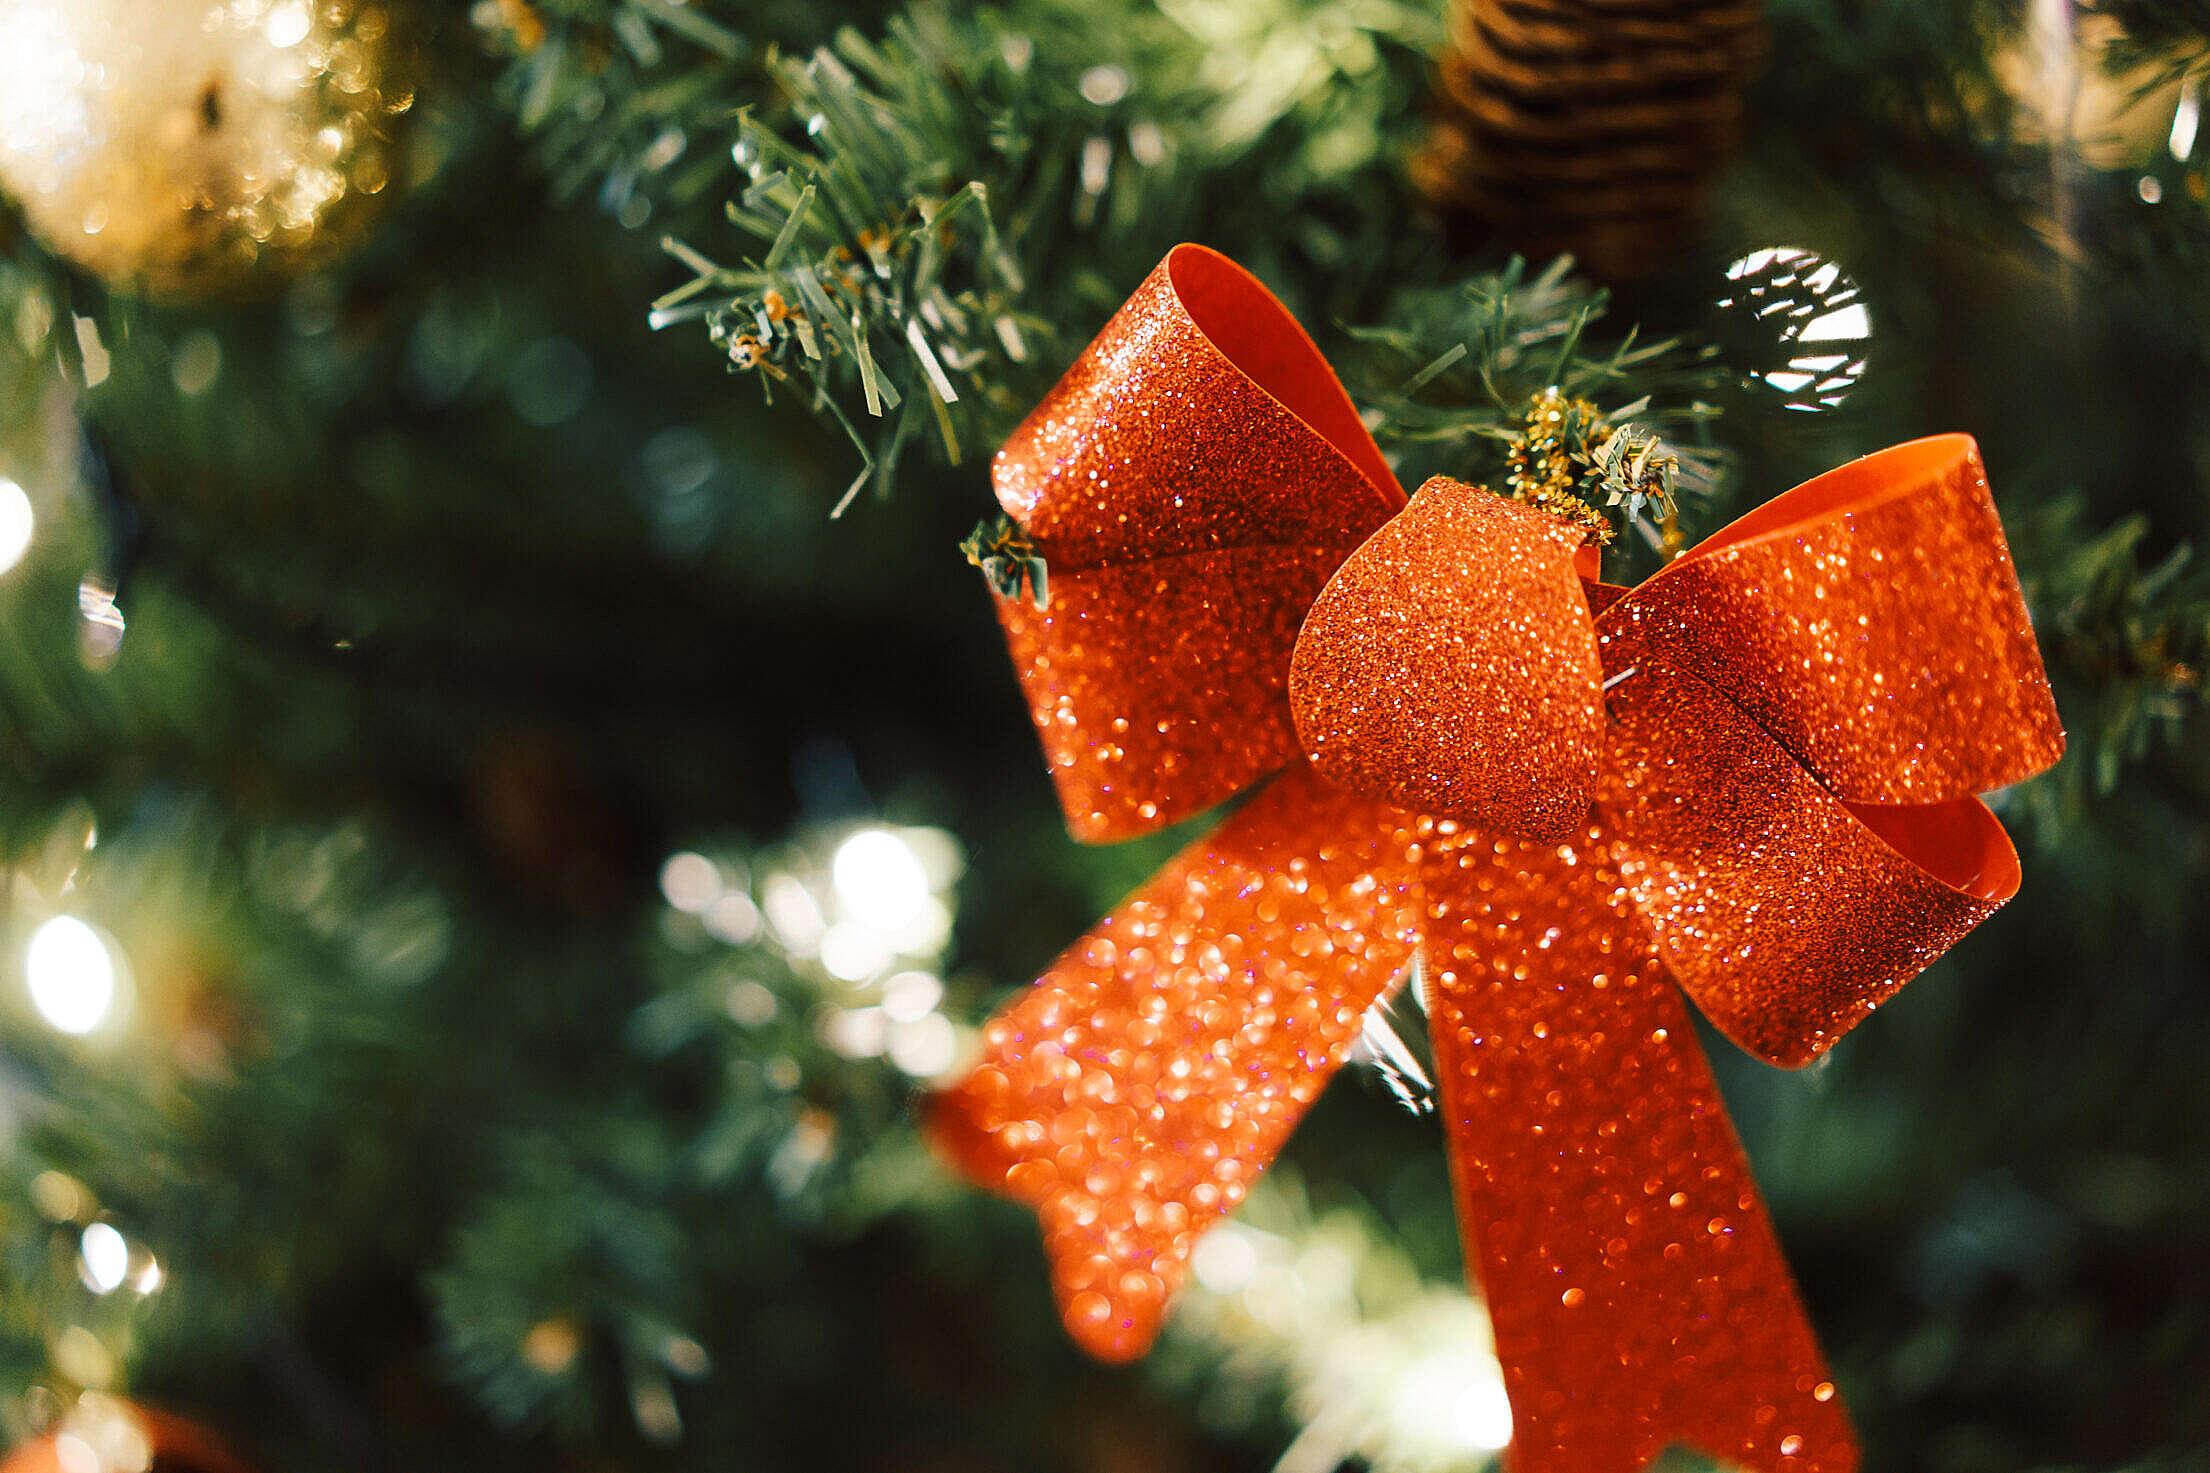 Glittering Christmas Tree Decoration Free Stock Photo